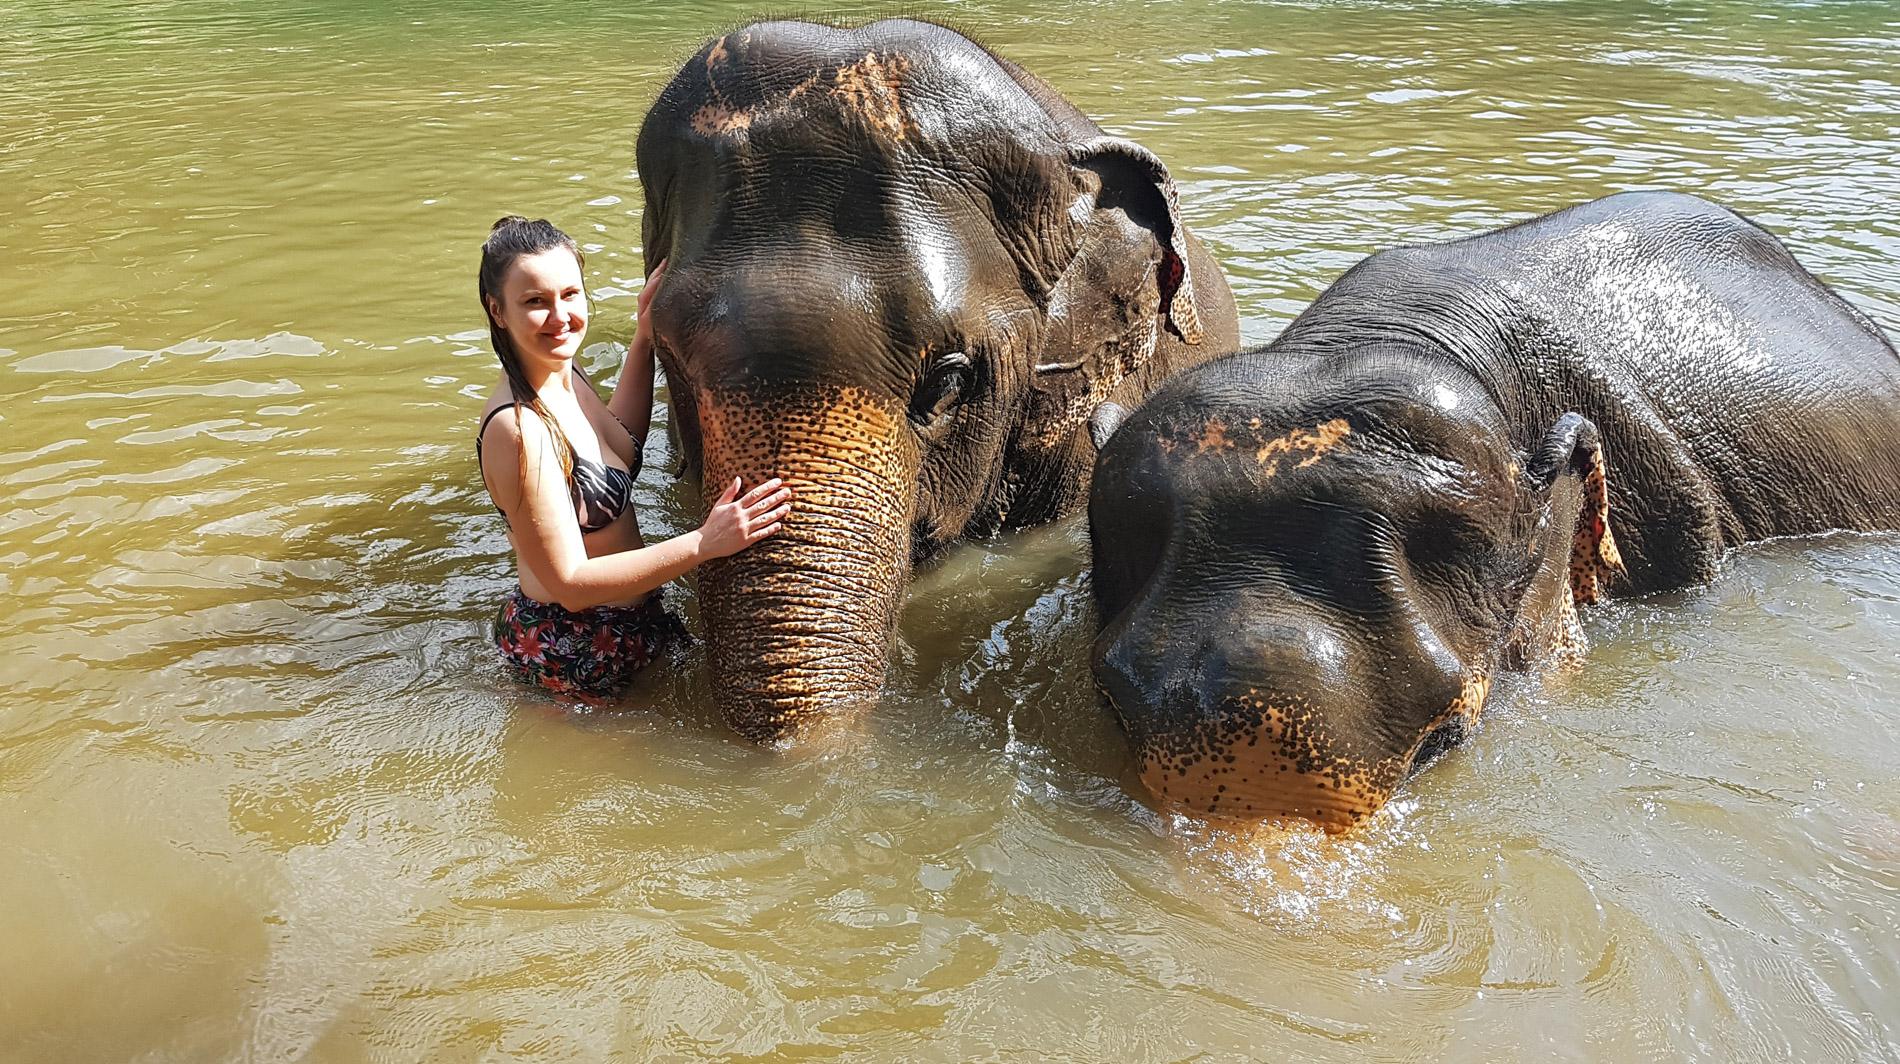 Autorka w sanktuarium słoni